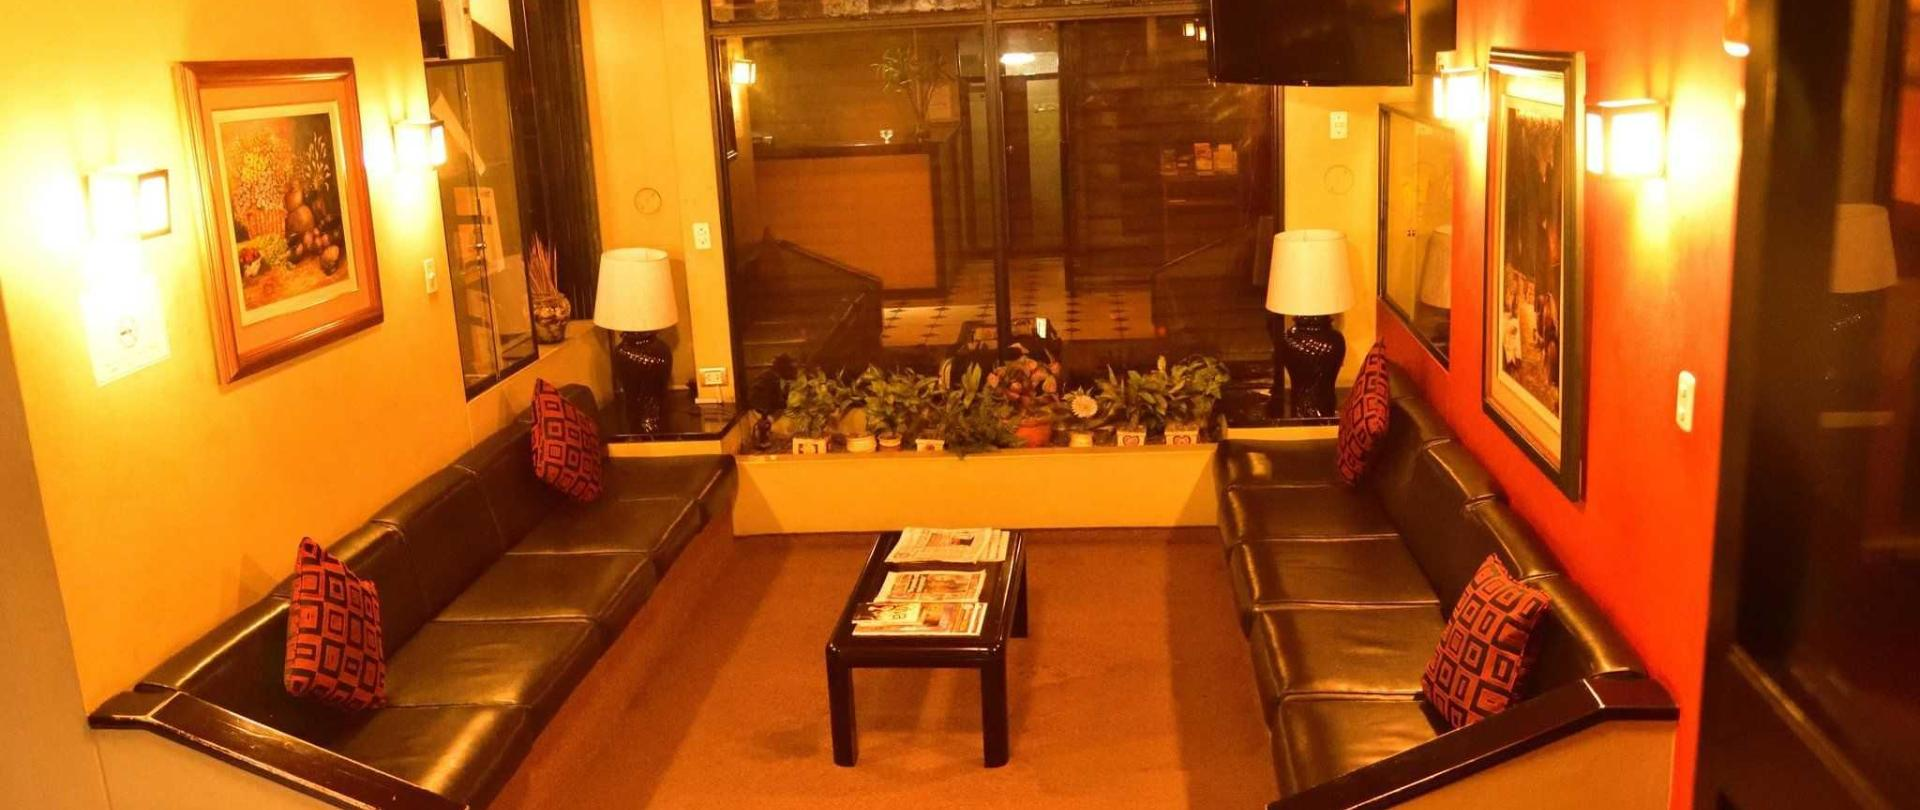 hotel-holiday-suites-3-estrellas-tacna-sala-de-espera-3.jpg